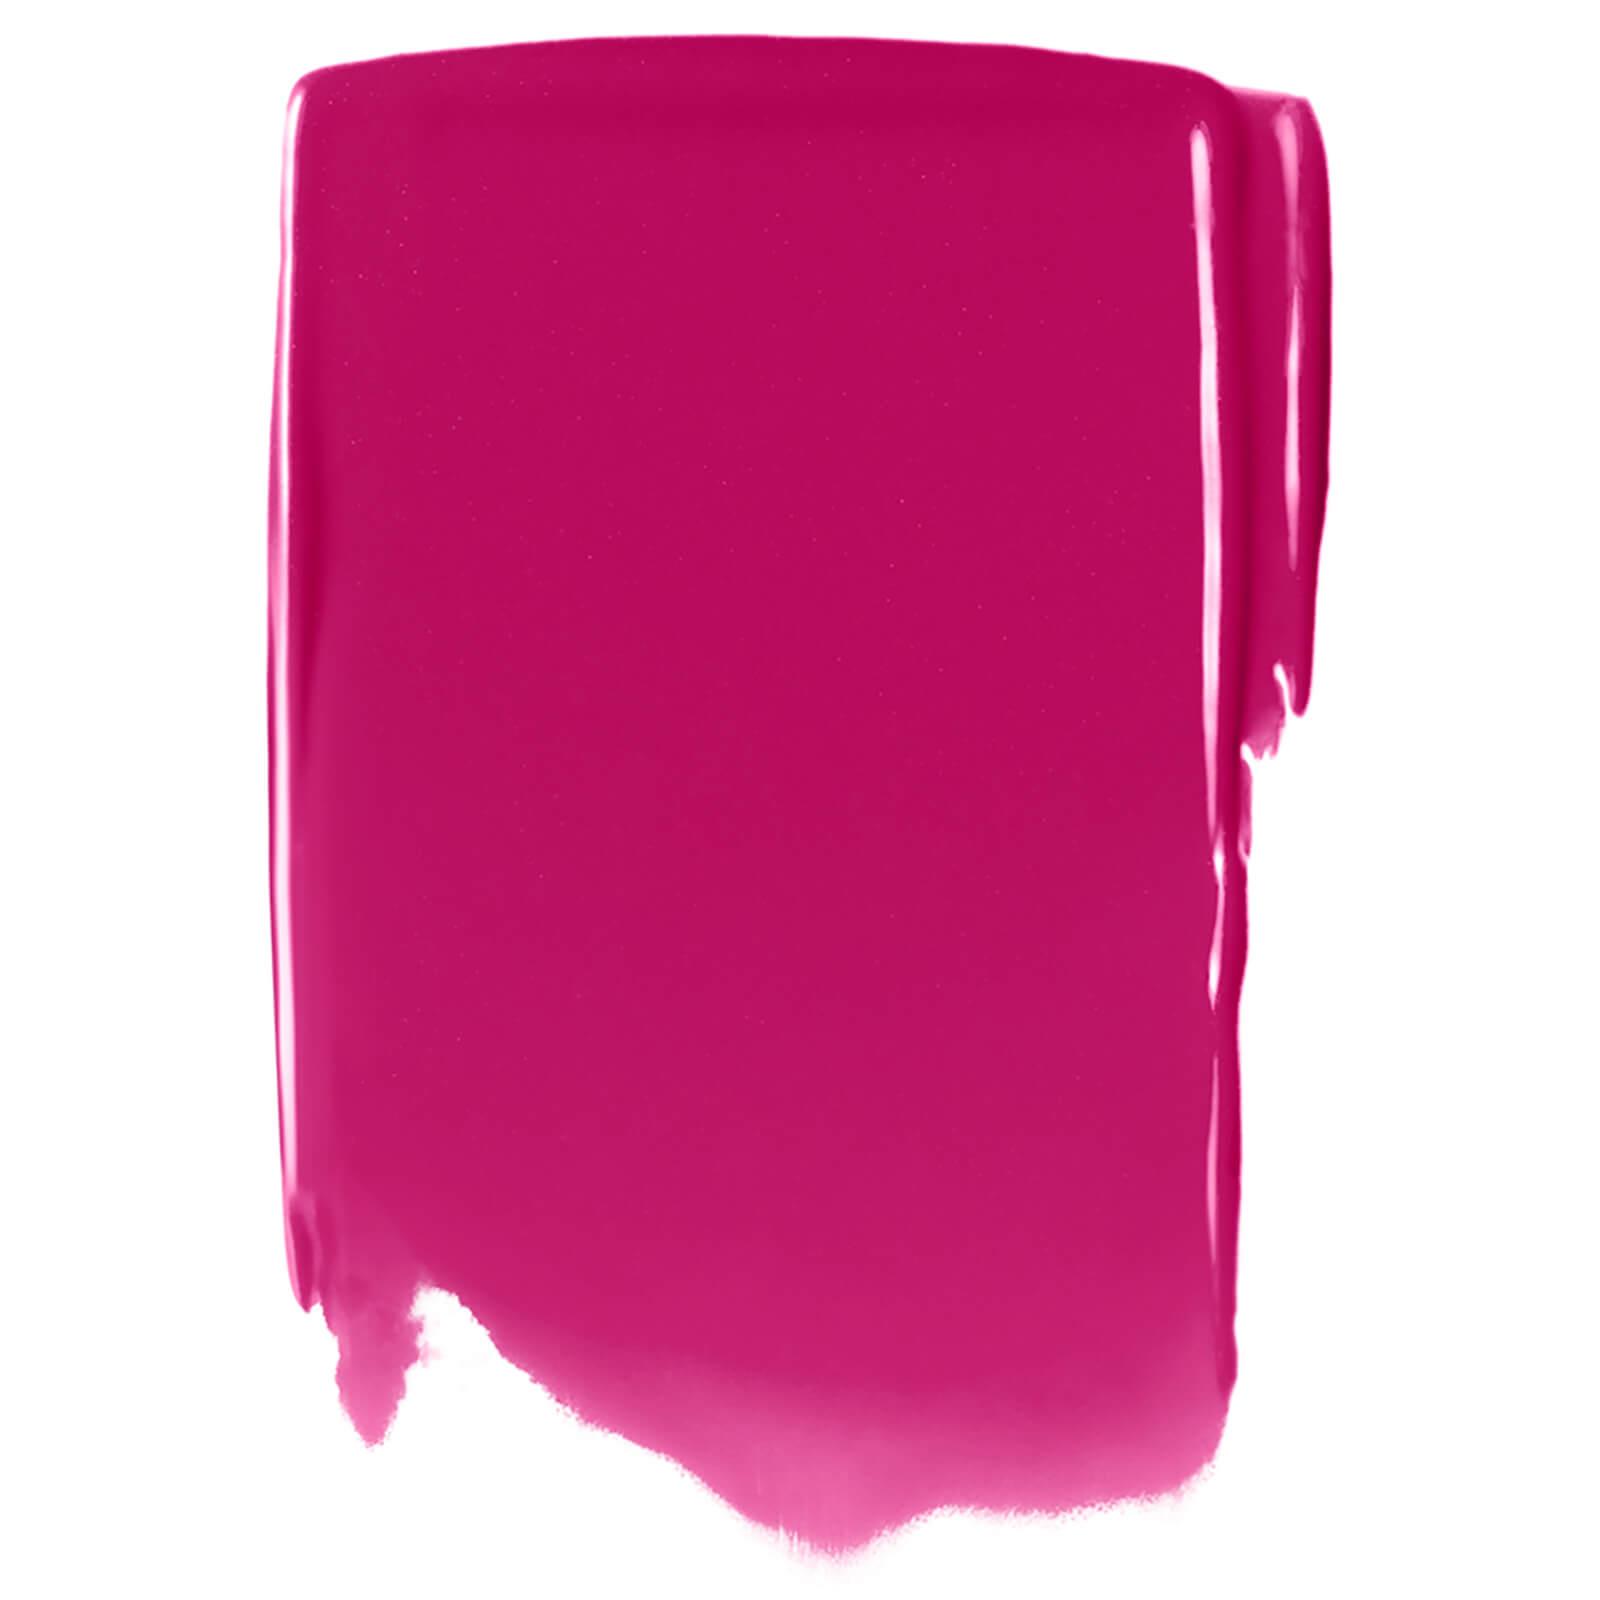 NARS Cosmetics Powermatte Lip Pigment 5.5ml (Various Shades) - Give It Up